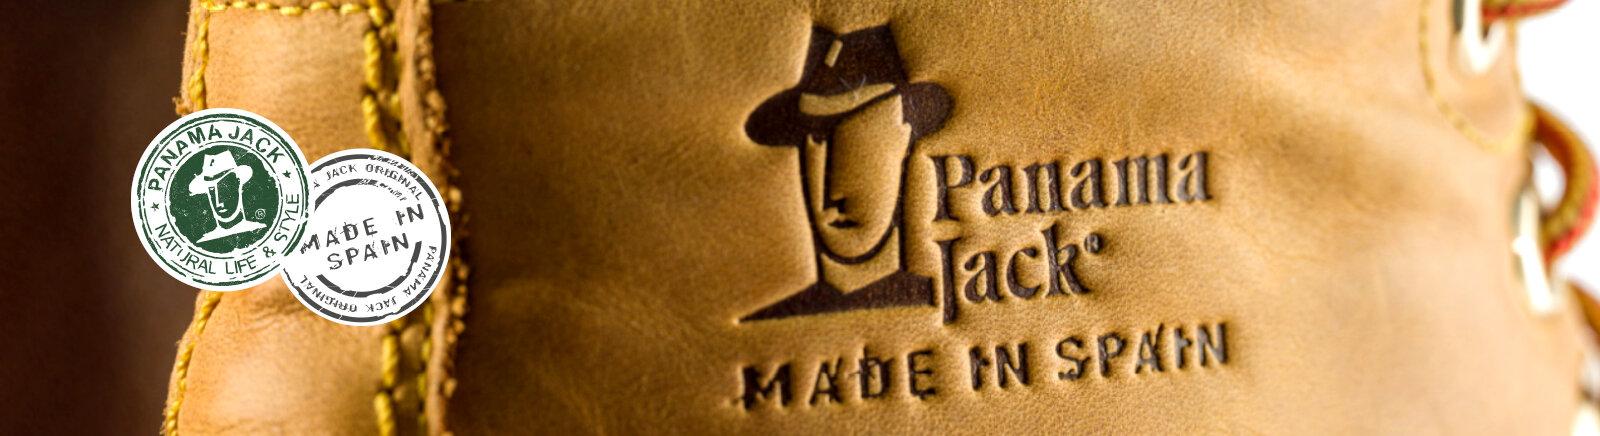 Panama Jack Herrenschuhe online bestellen im Prange Schuhe Shop